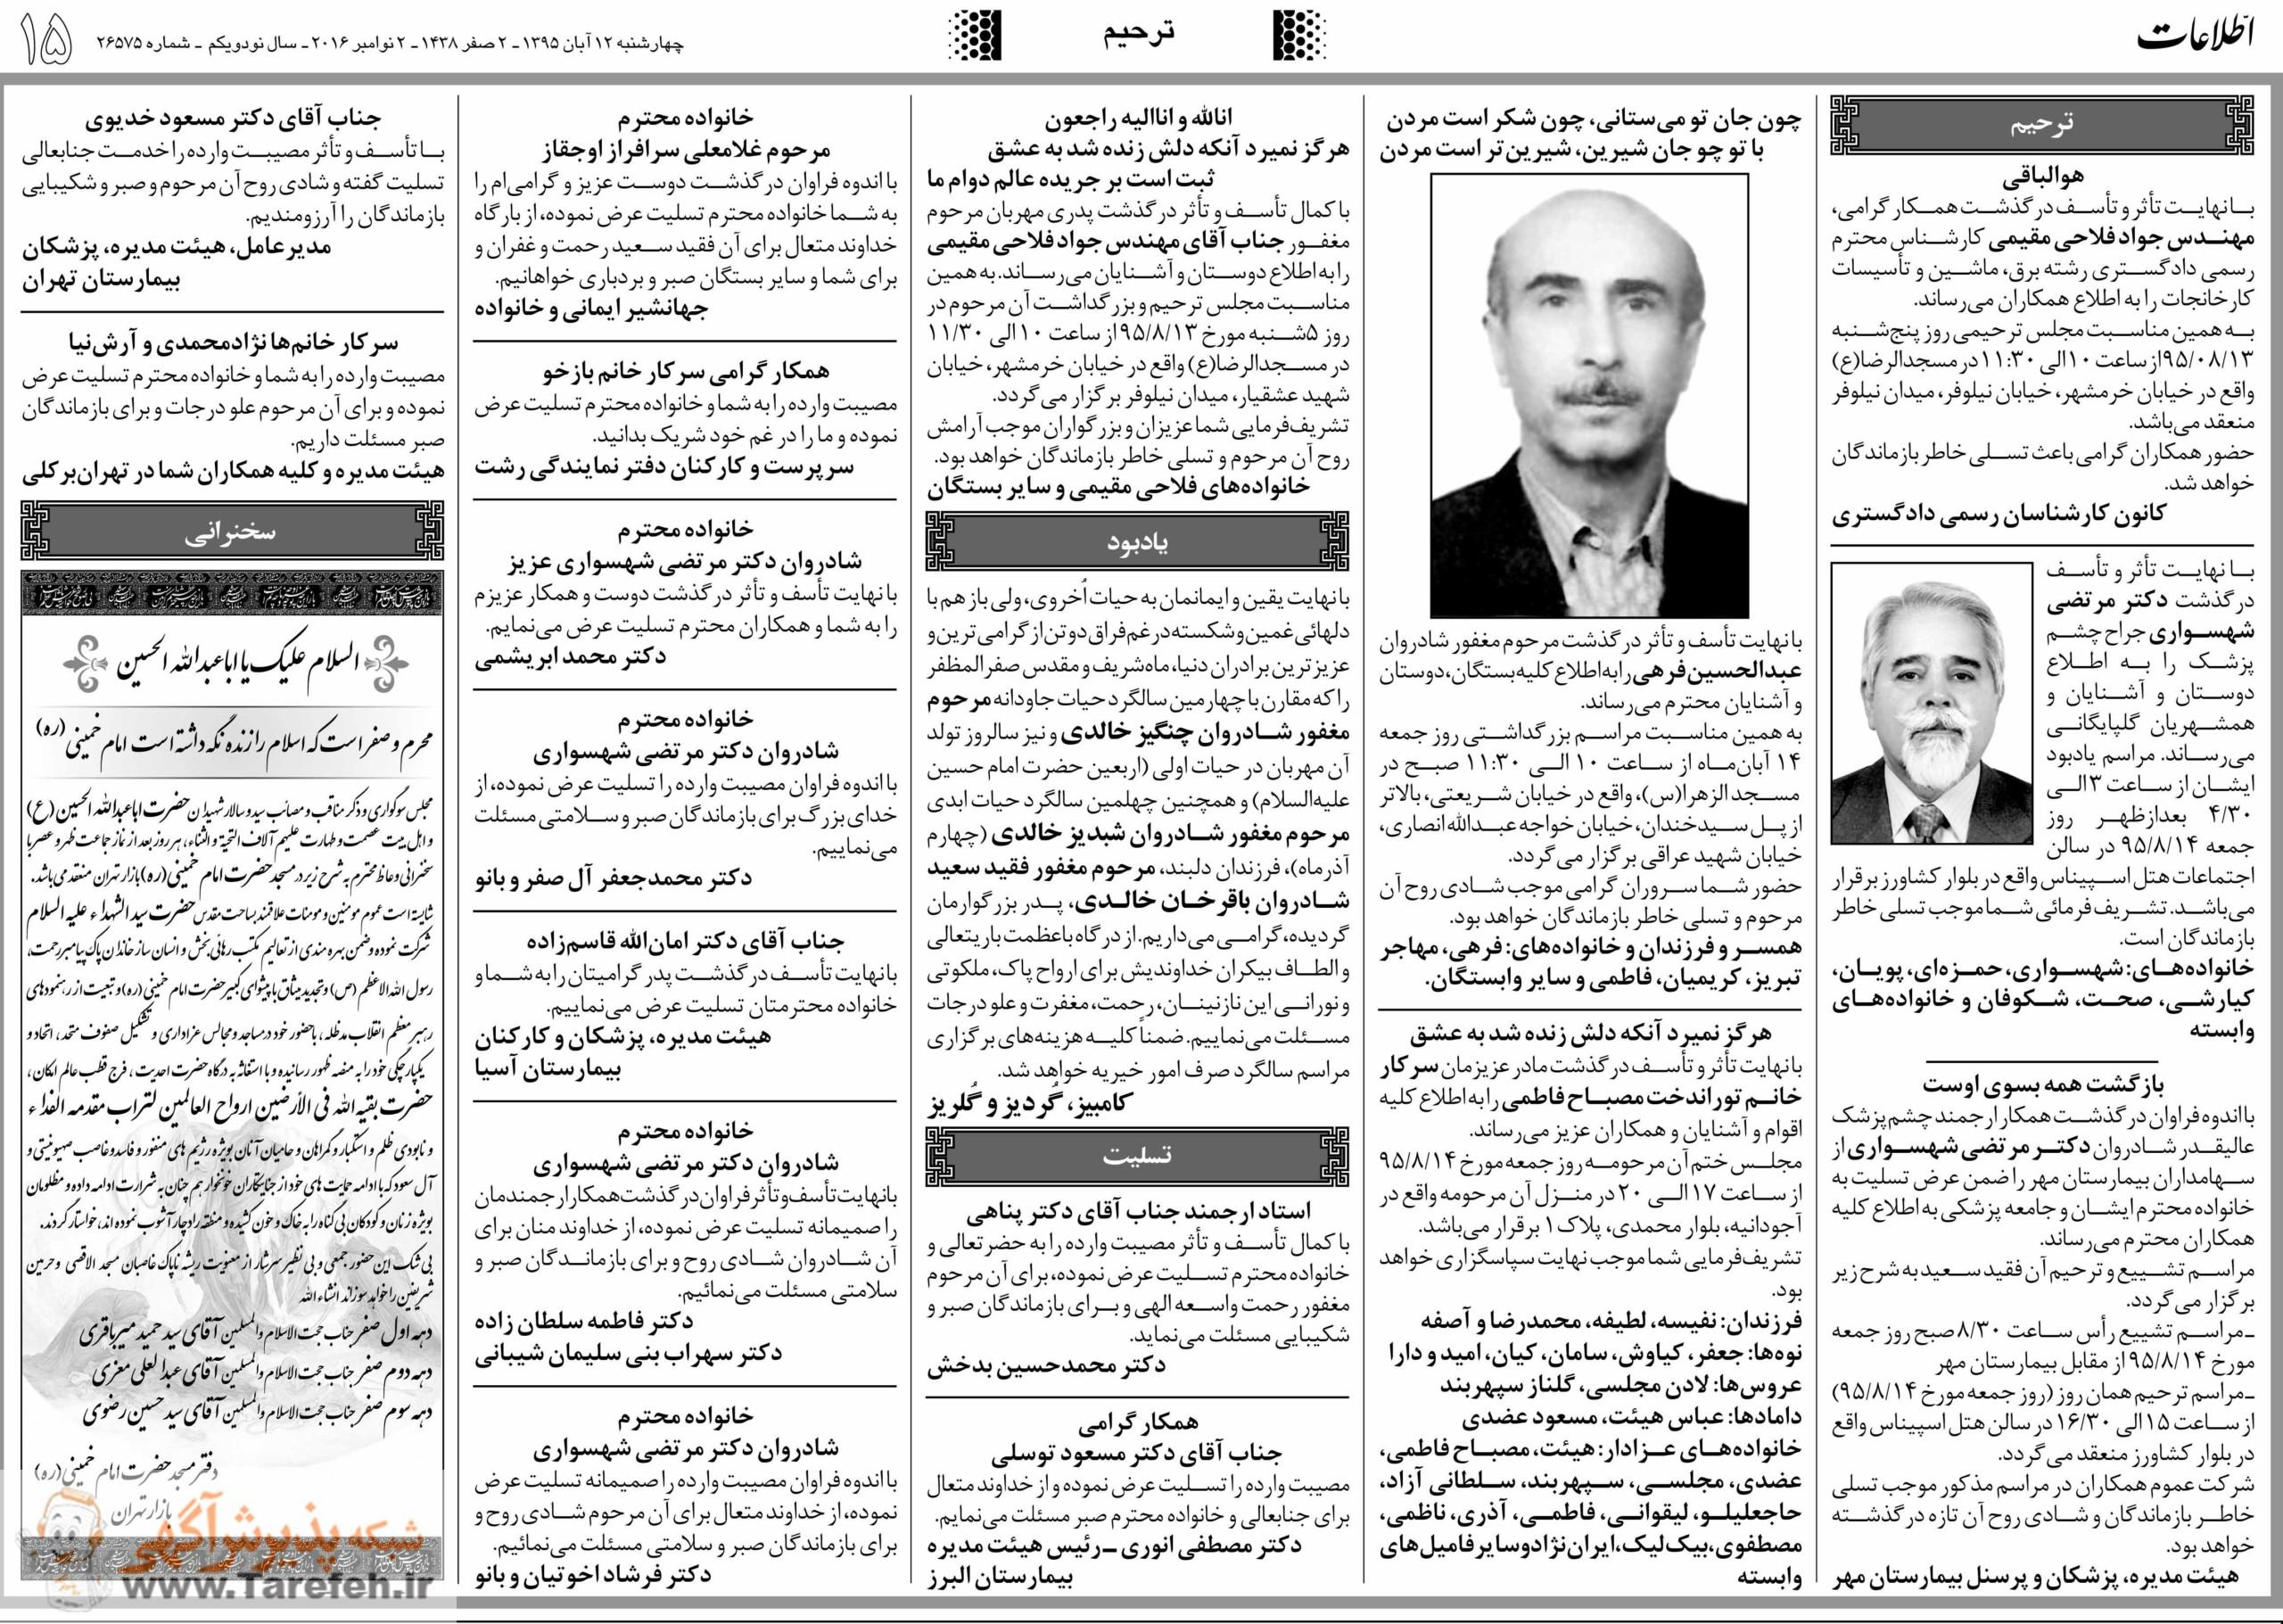 چاپ آگهی ترحیم و تسلیت